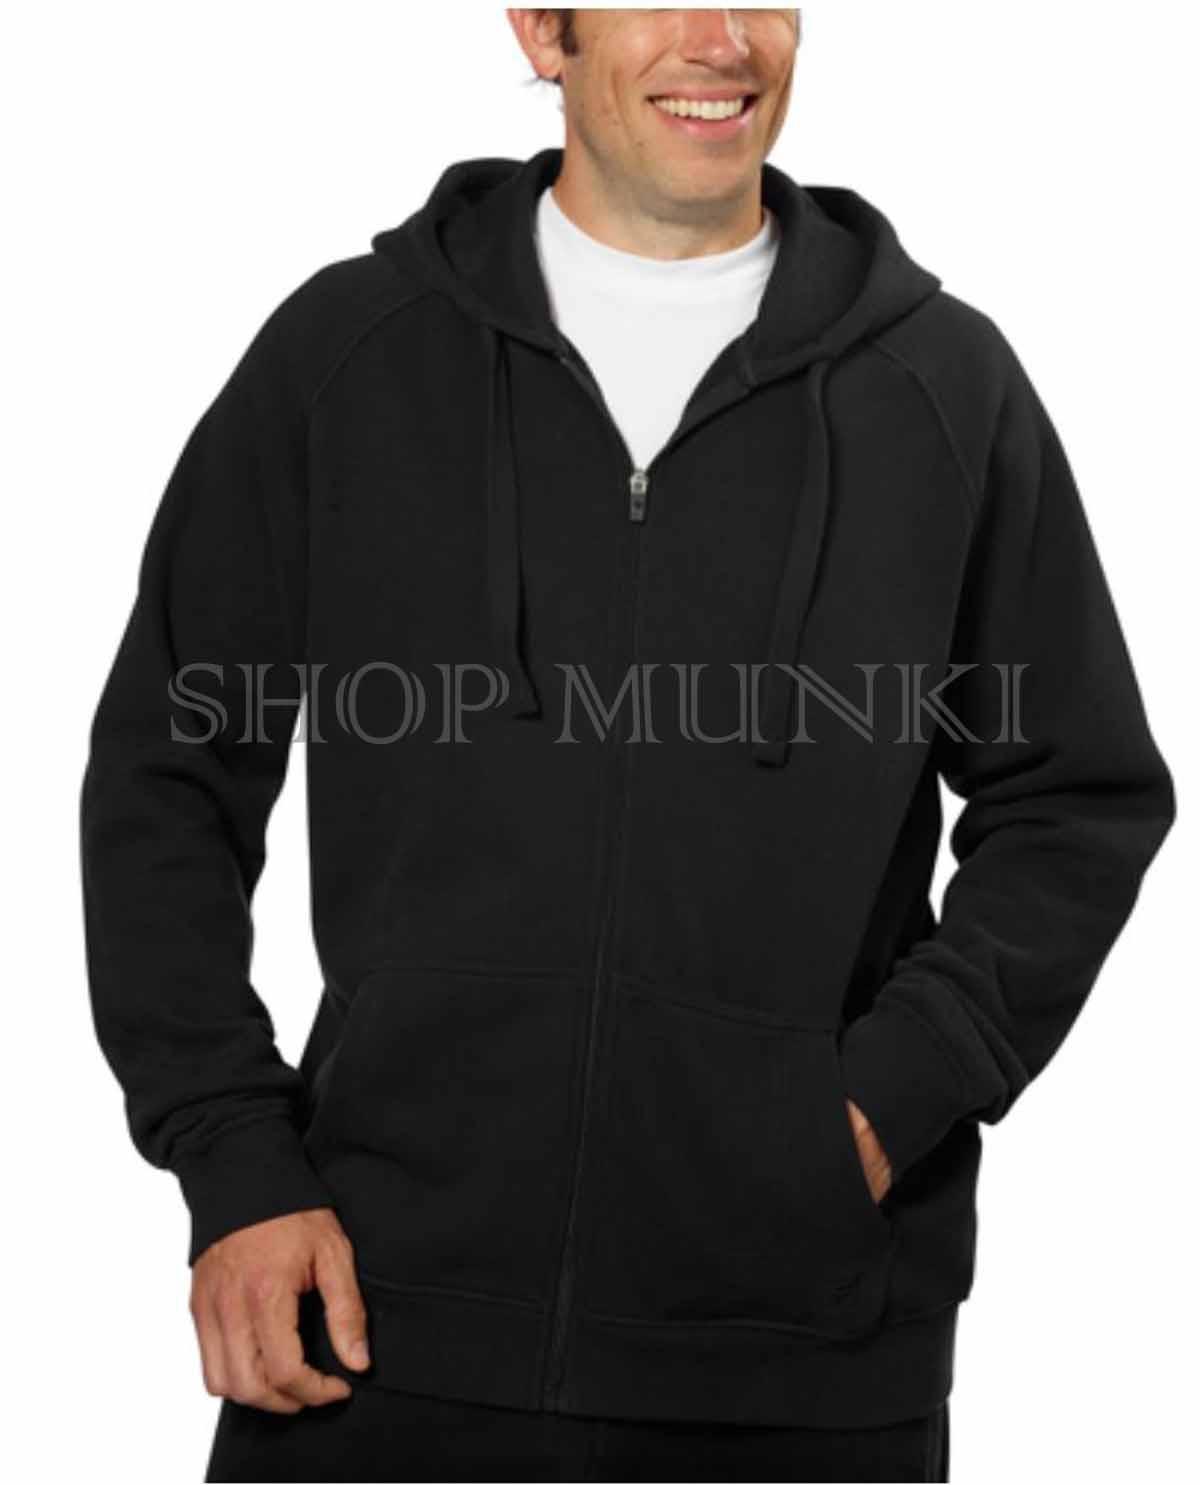 b02114b62e4f Fila Men s Full Zip Hooded Soft Fleece Sweatshirt Jacket with media ...